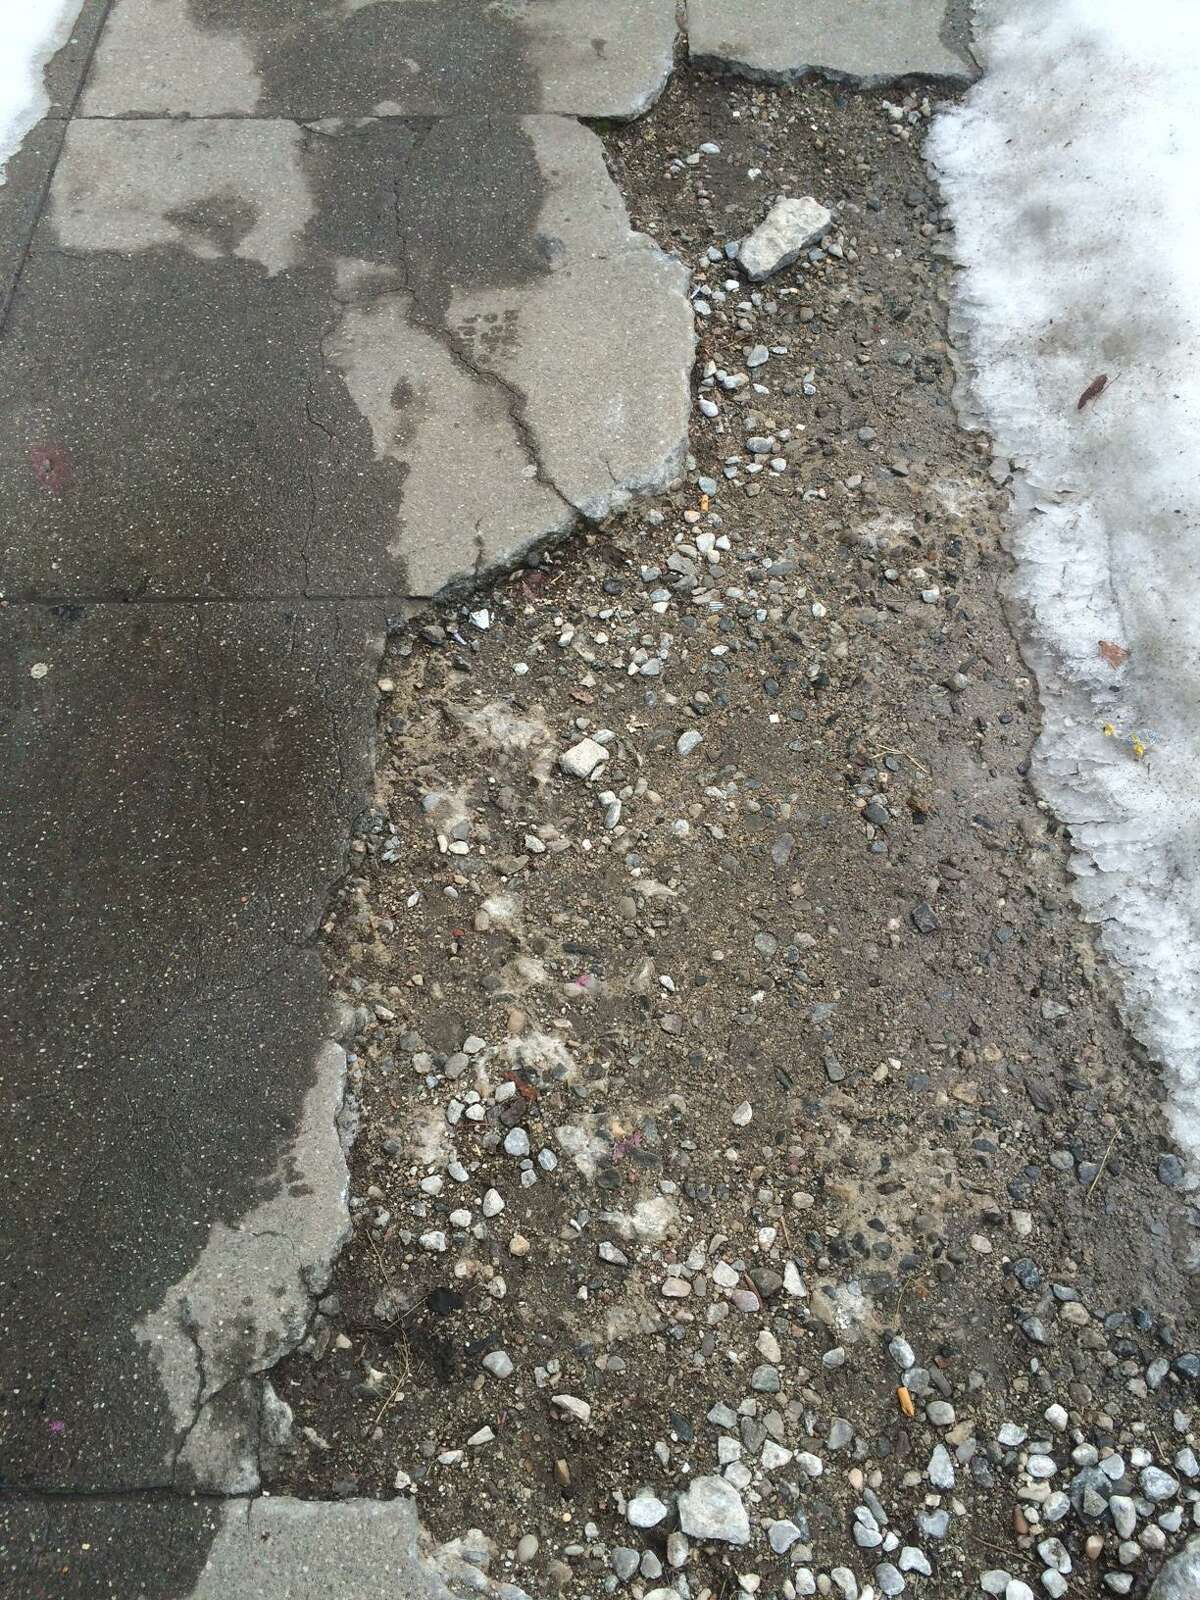 Cracked and damaged sidewalks along Main St. in Bridgeport, Conn. Jan. 29. 2016.